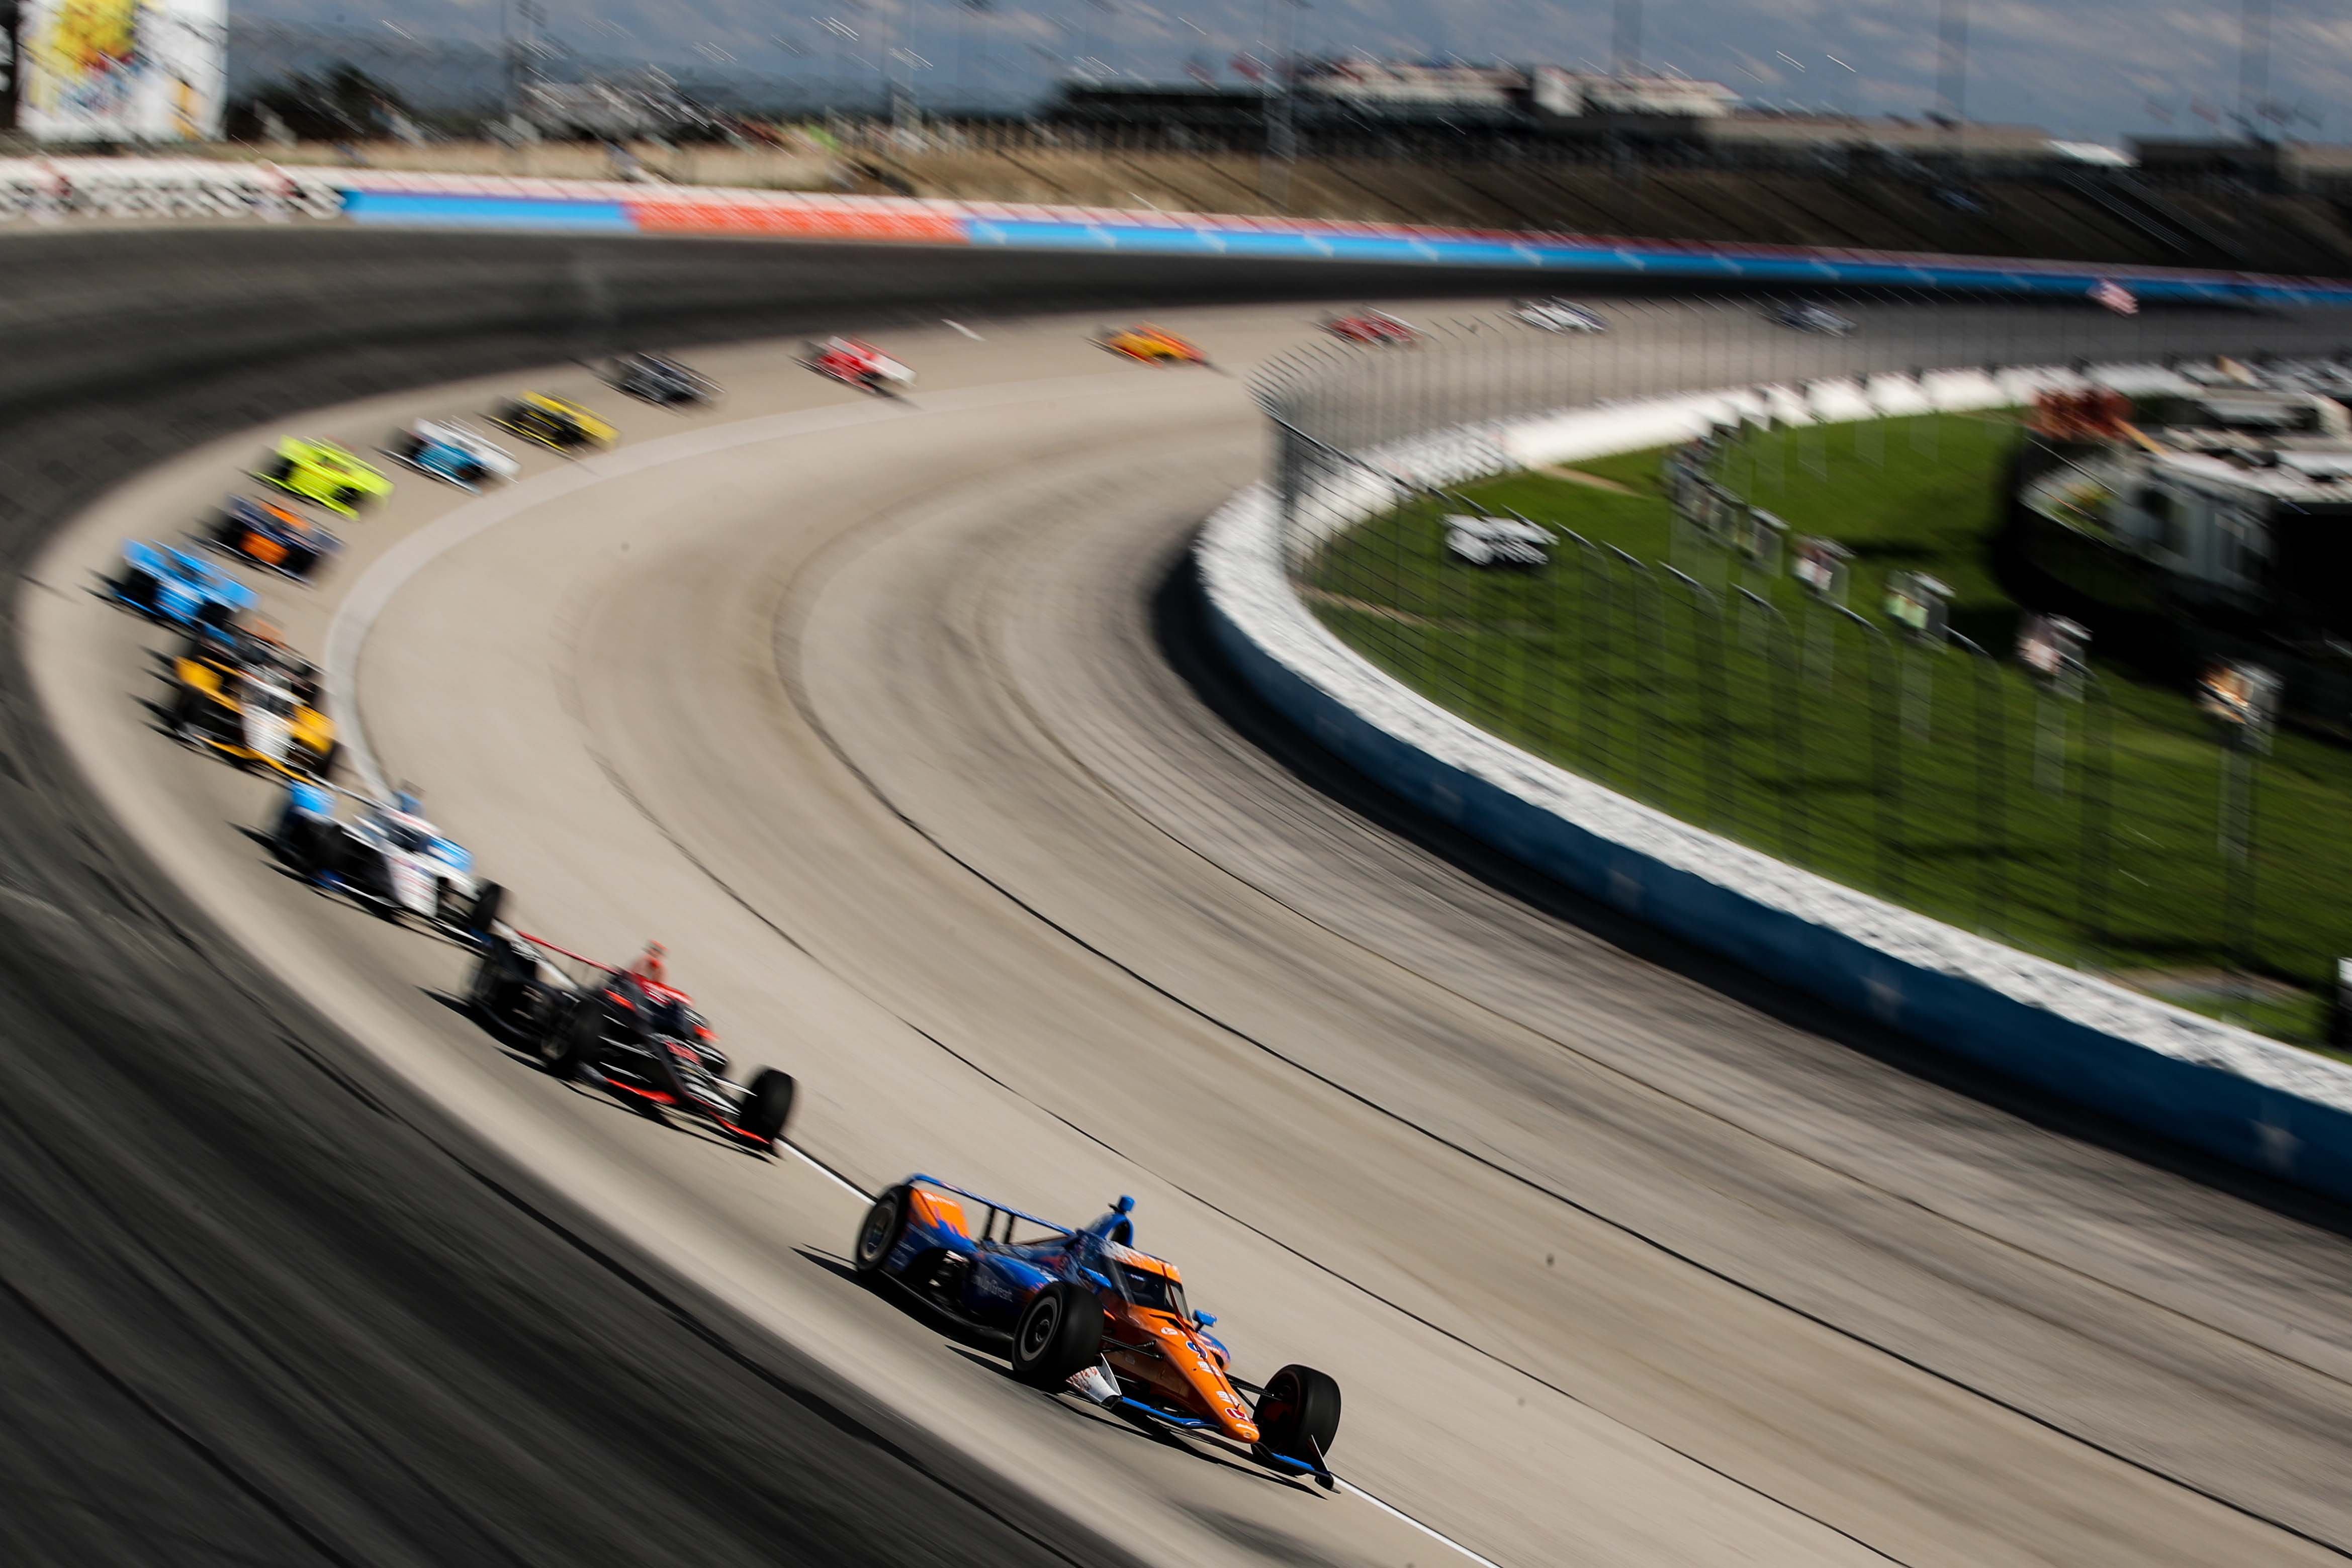 Scott Dixon leads at Texas Motor Speedway - Indycar Series